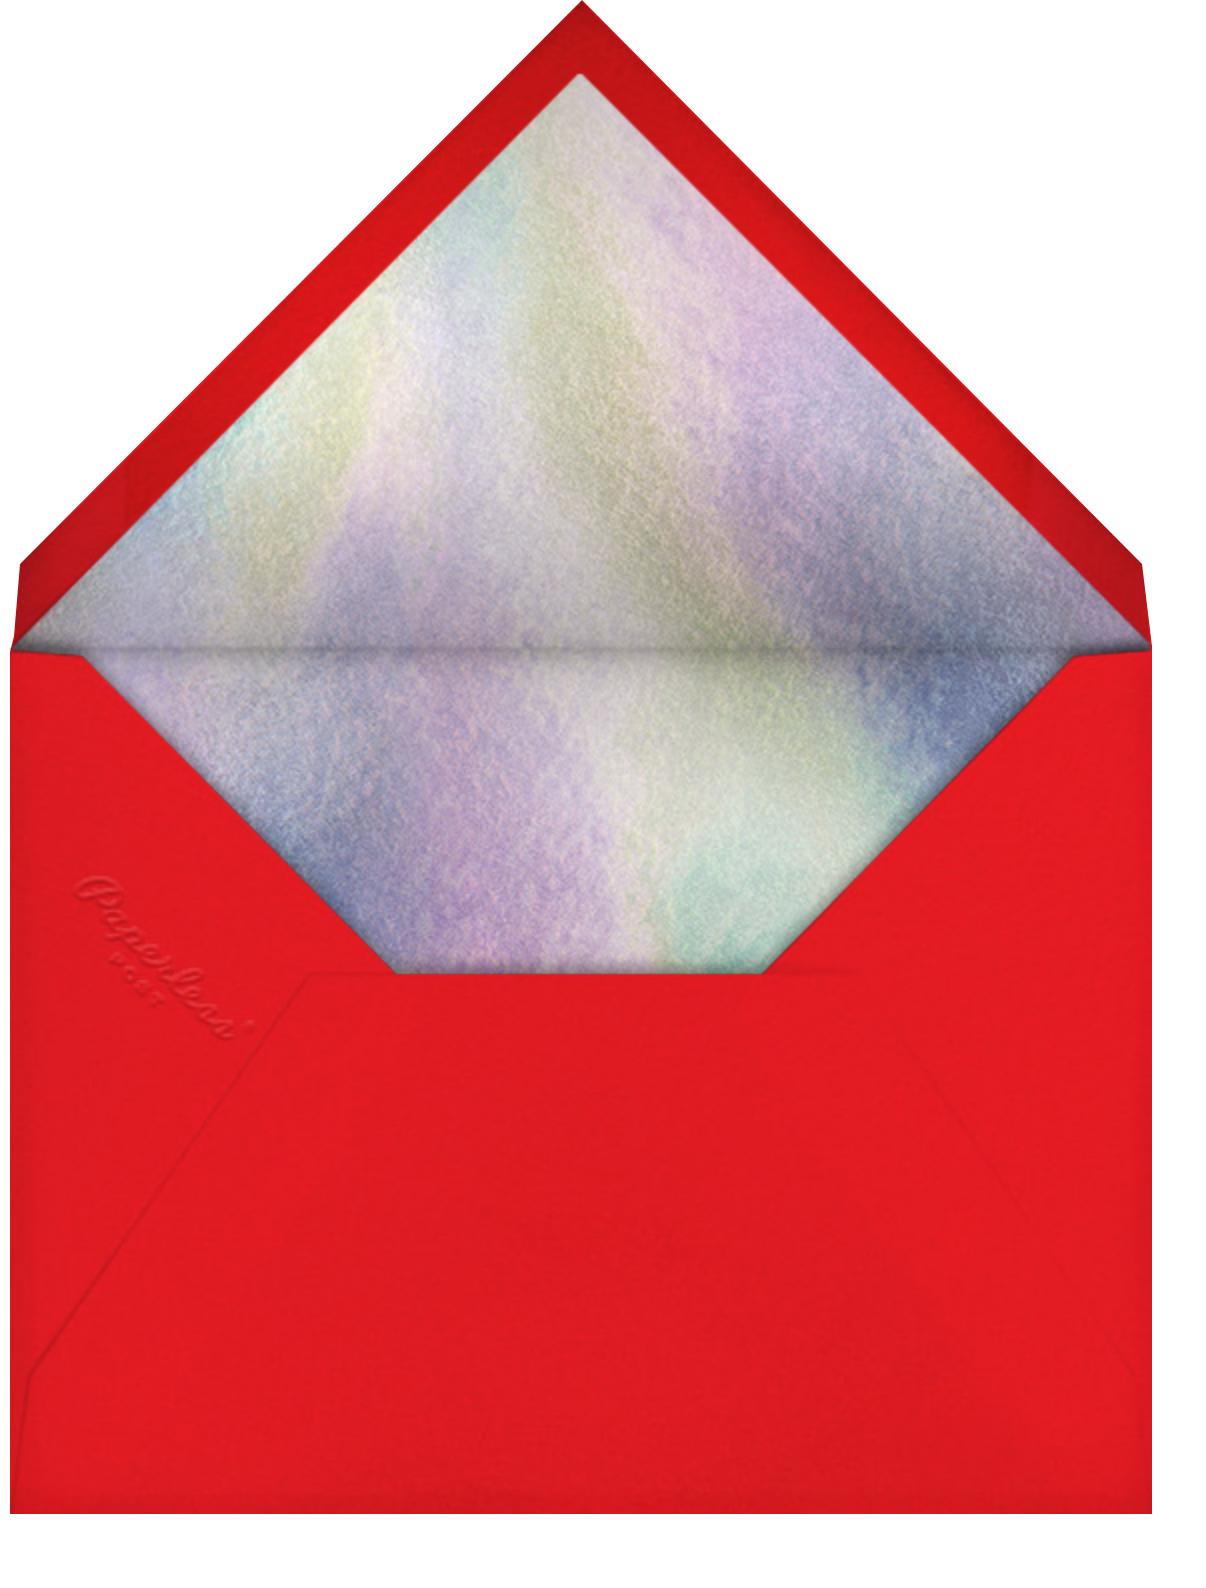 Sweet Holiday - Meri Meri - Holiday cards - envelope back